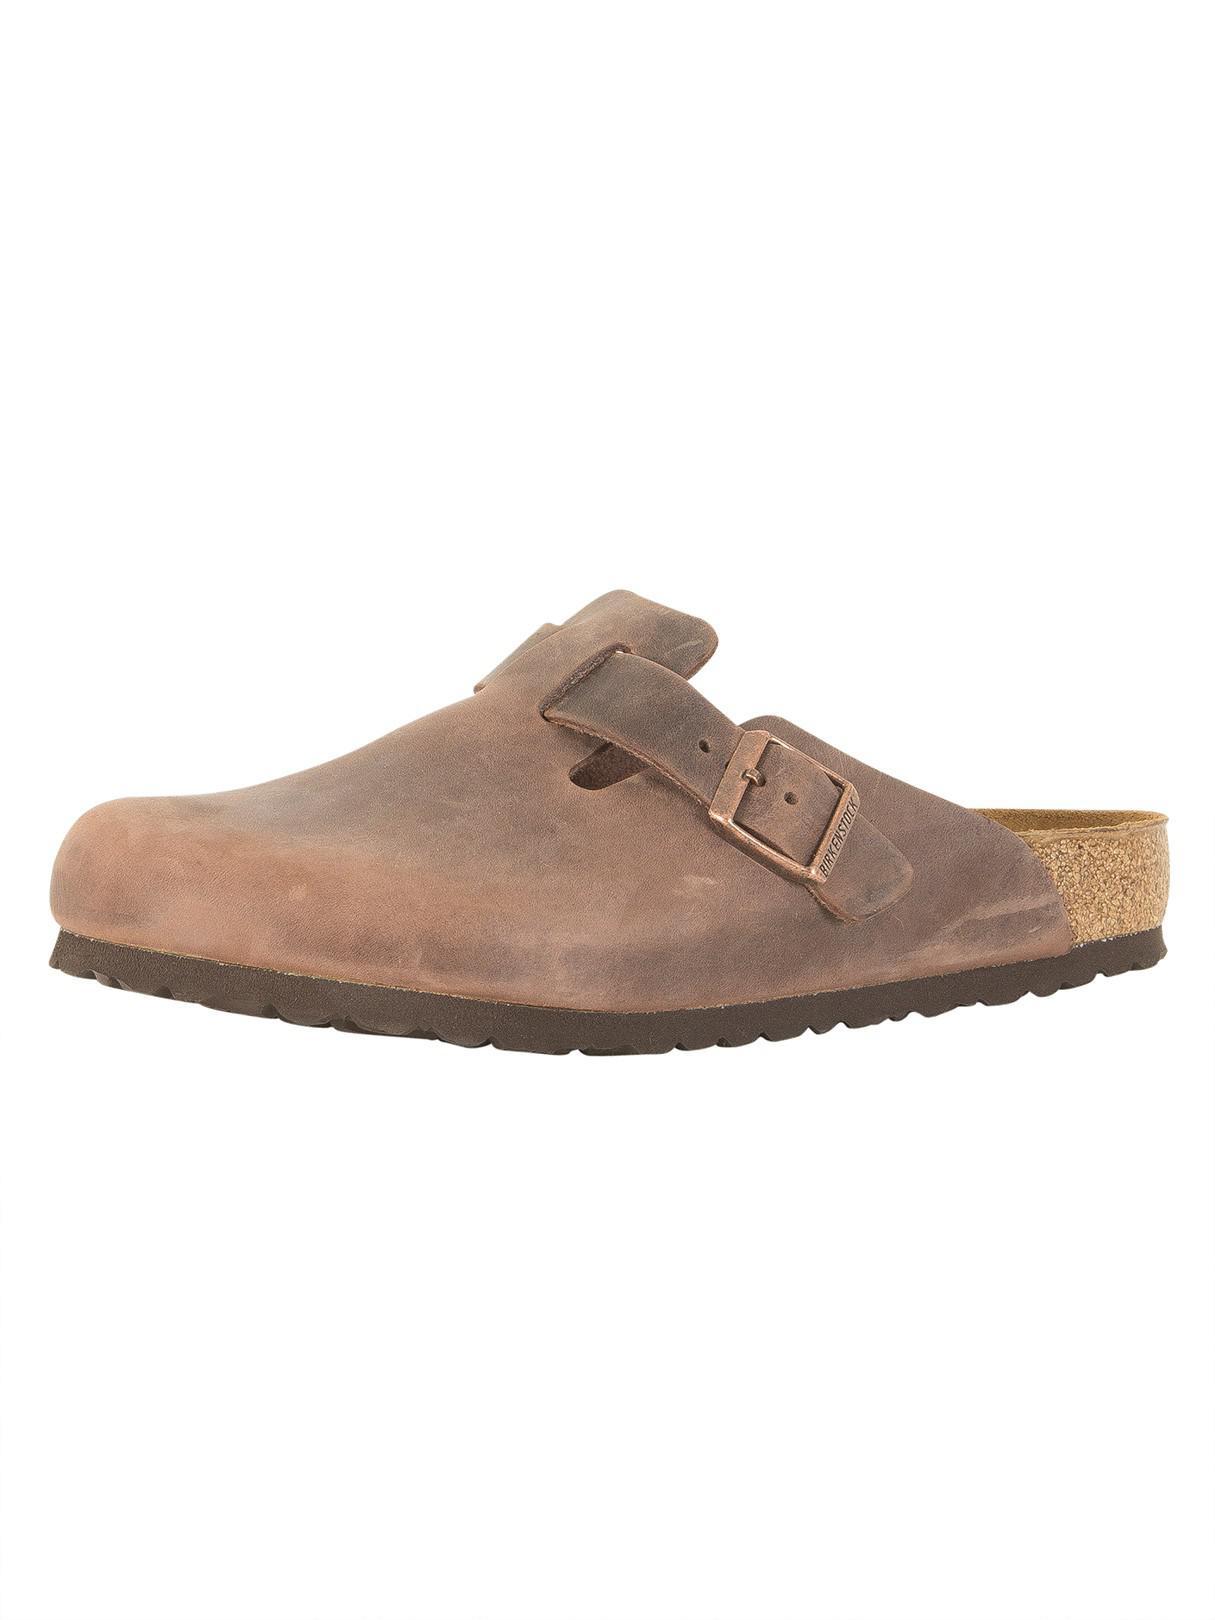 20b1cb98bd7e Birkenstock Habana Boston Oiled Leather Slip On Sandals in Brown for ...